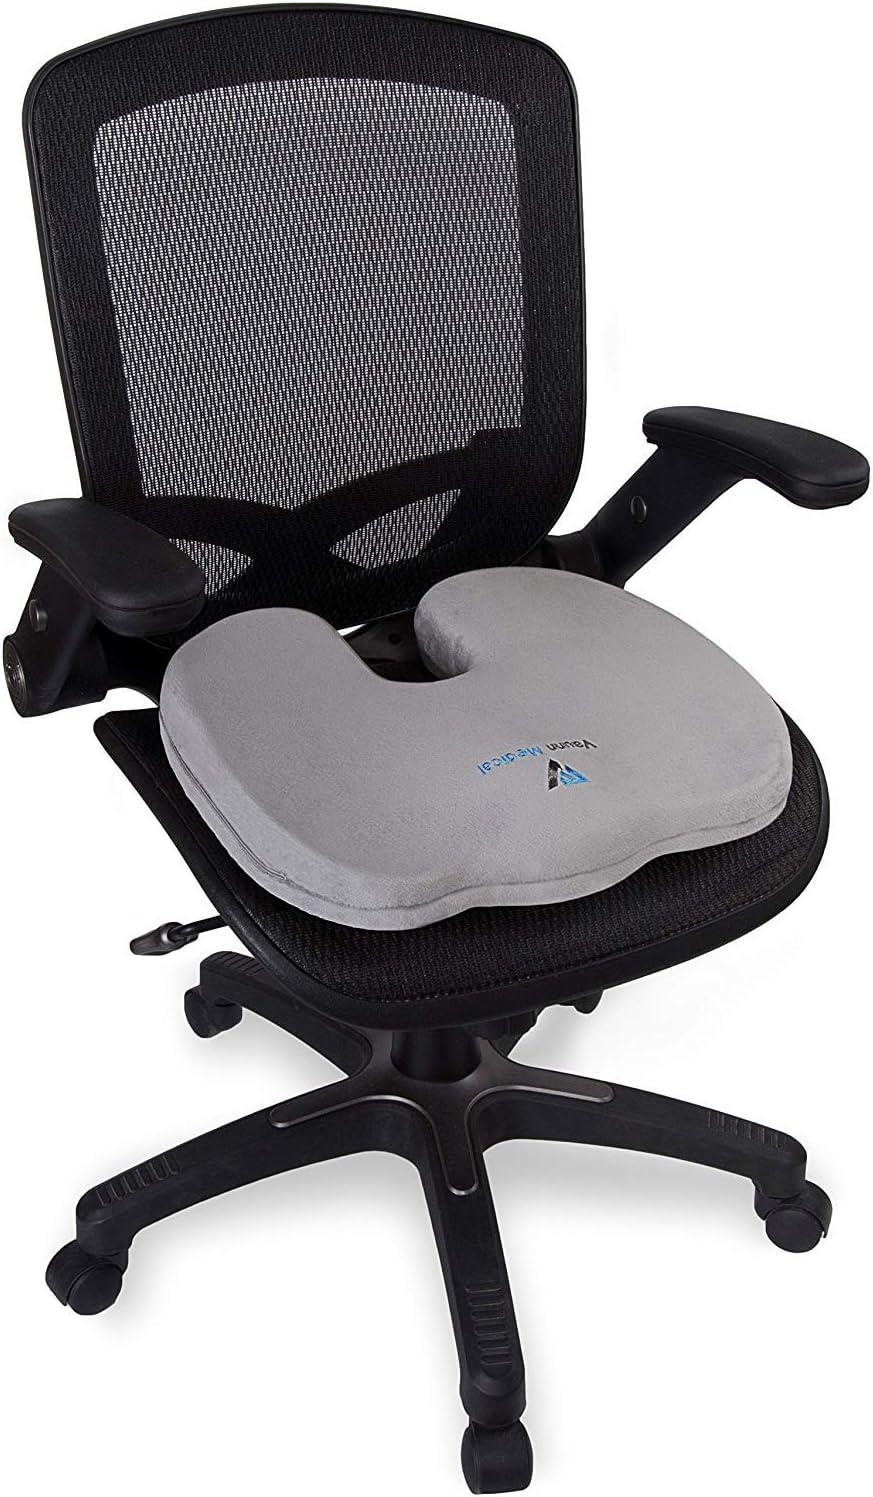 Amazon.com: Vaunn Medical Firm Seat Cushion - Cojín para ...